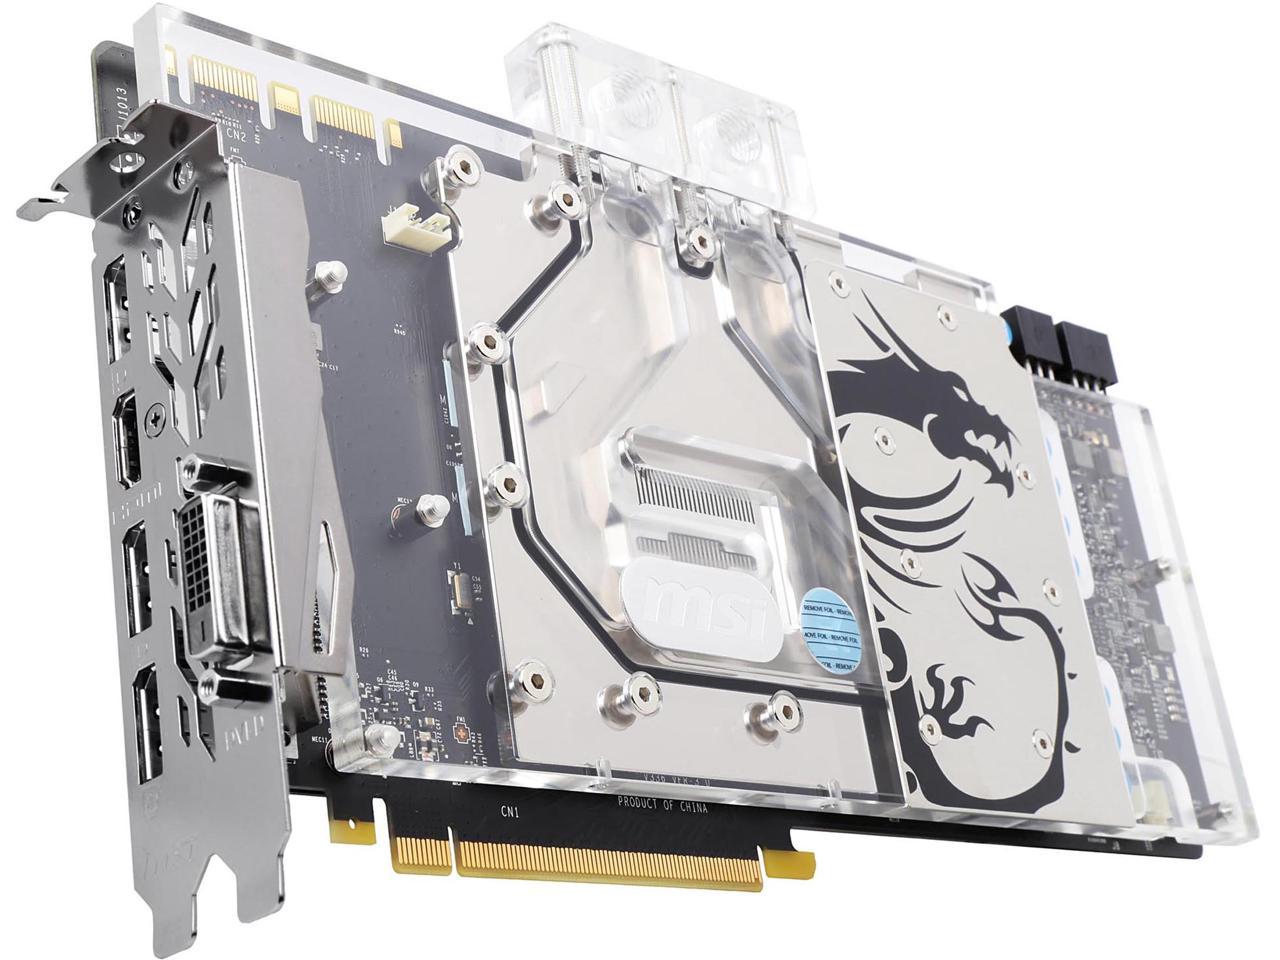 MSI GeForce GTX 1080 Sea Hawk X EK 8GB Video Card + Destiny